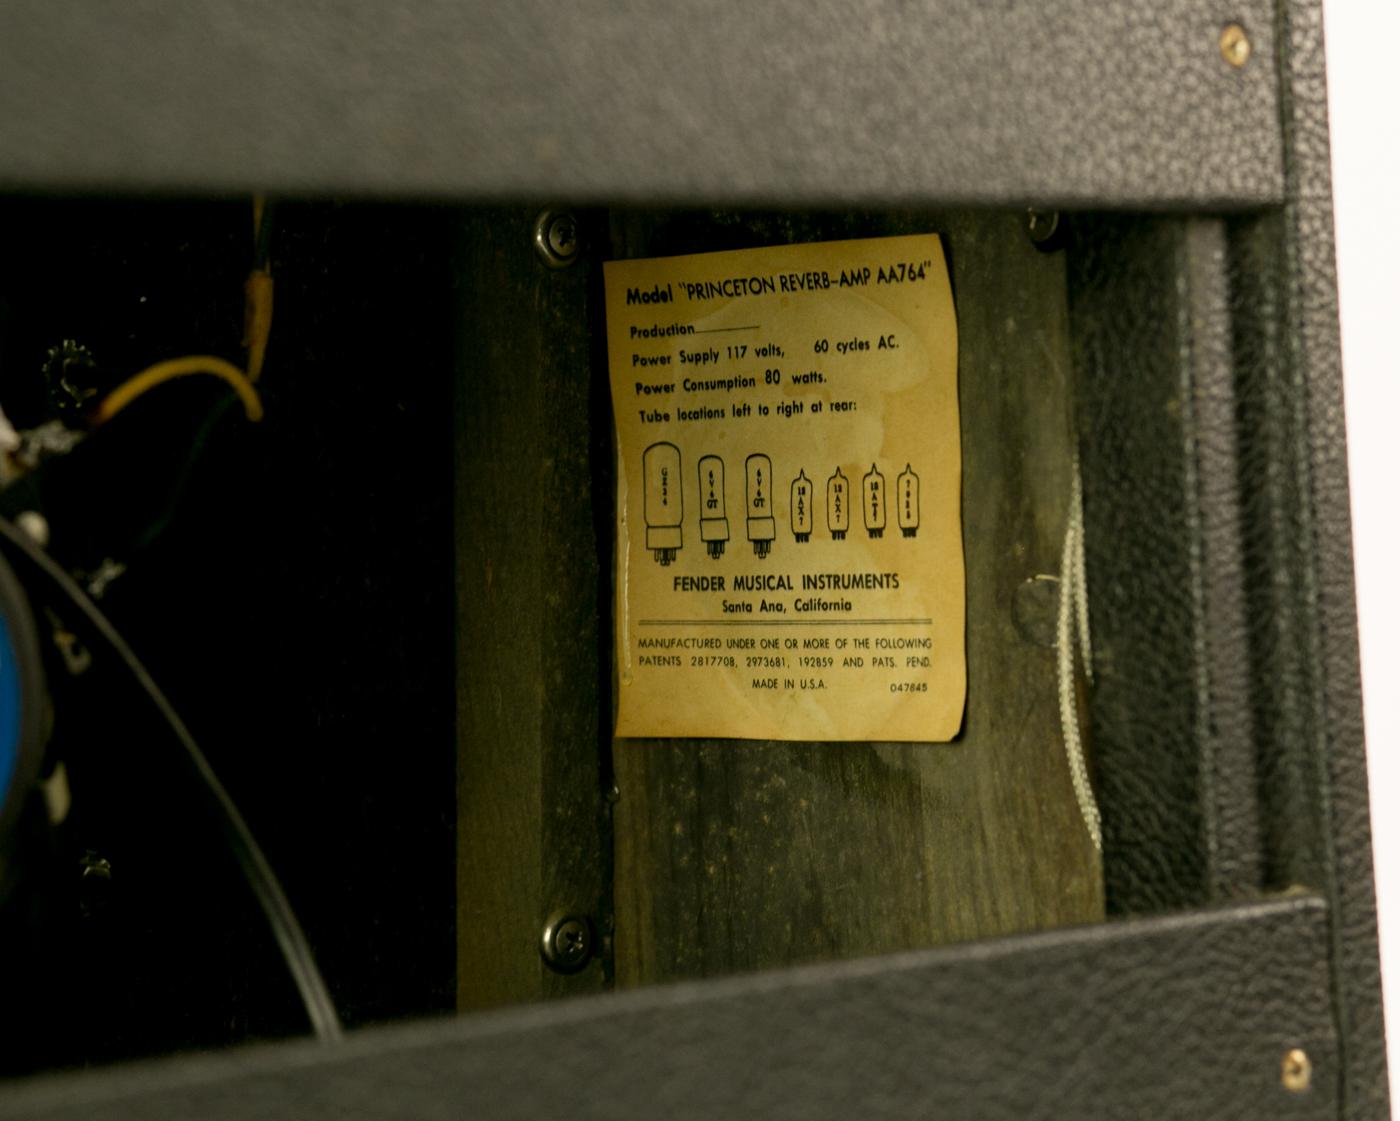 1969 Fender Princeton Reverb Drip Edge detail 3